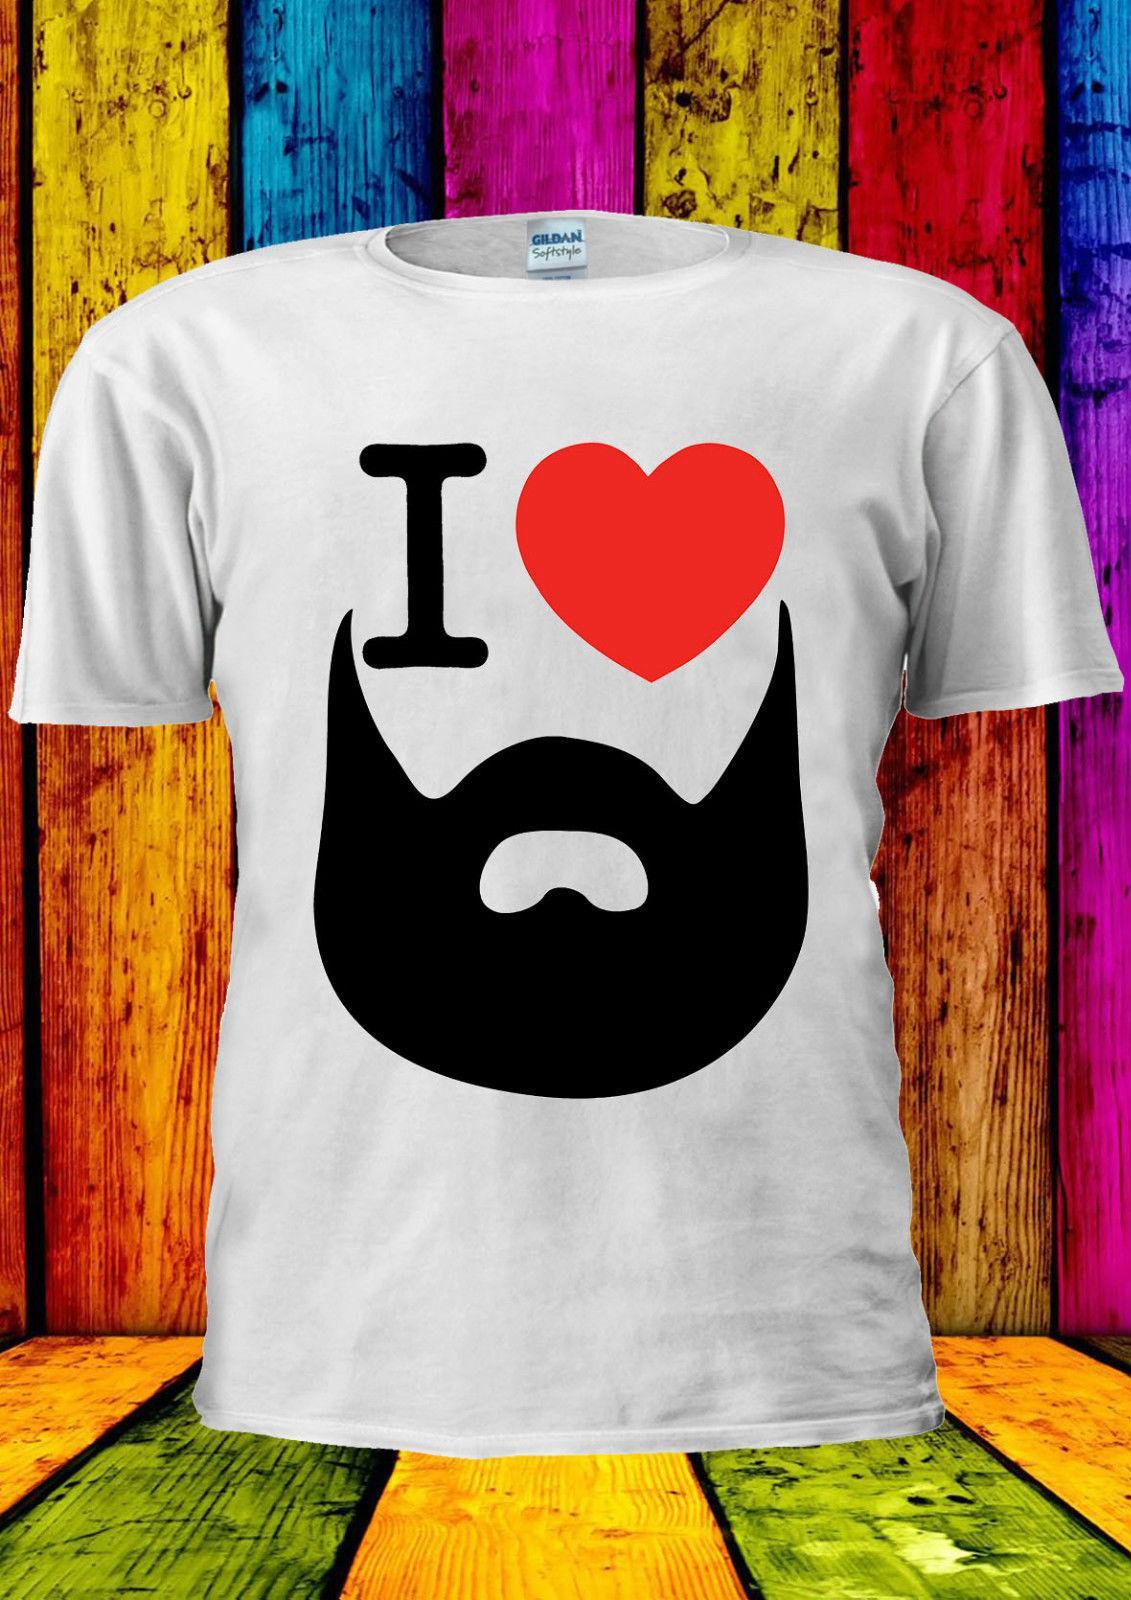 d57264316e I Love My Beard Funny Tumblr T Shirt Vest Tank Top Men Women Unisex 2399  2018 Funny Tee ,Cute T Shirts Man ,100% Cotton Cool , It T Shirt The T Shirt  ...